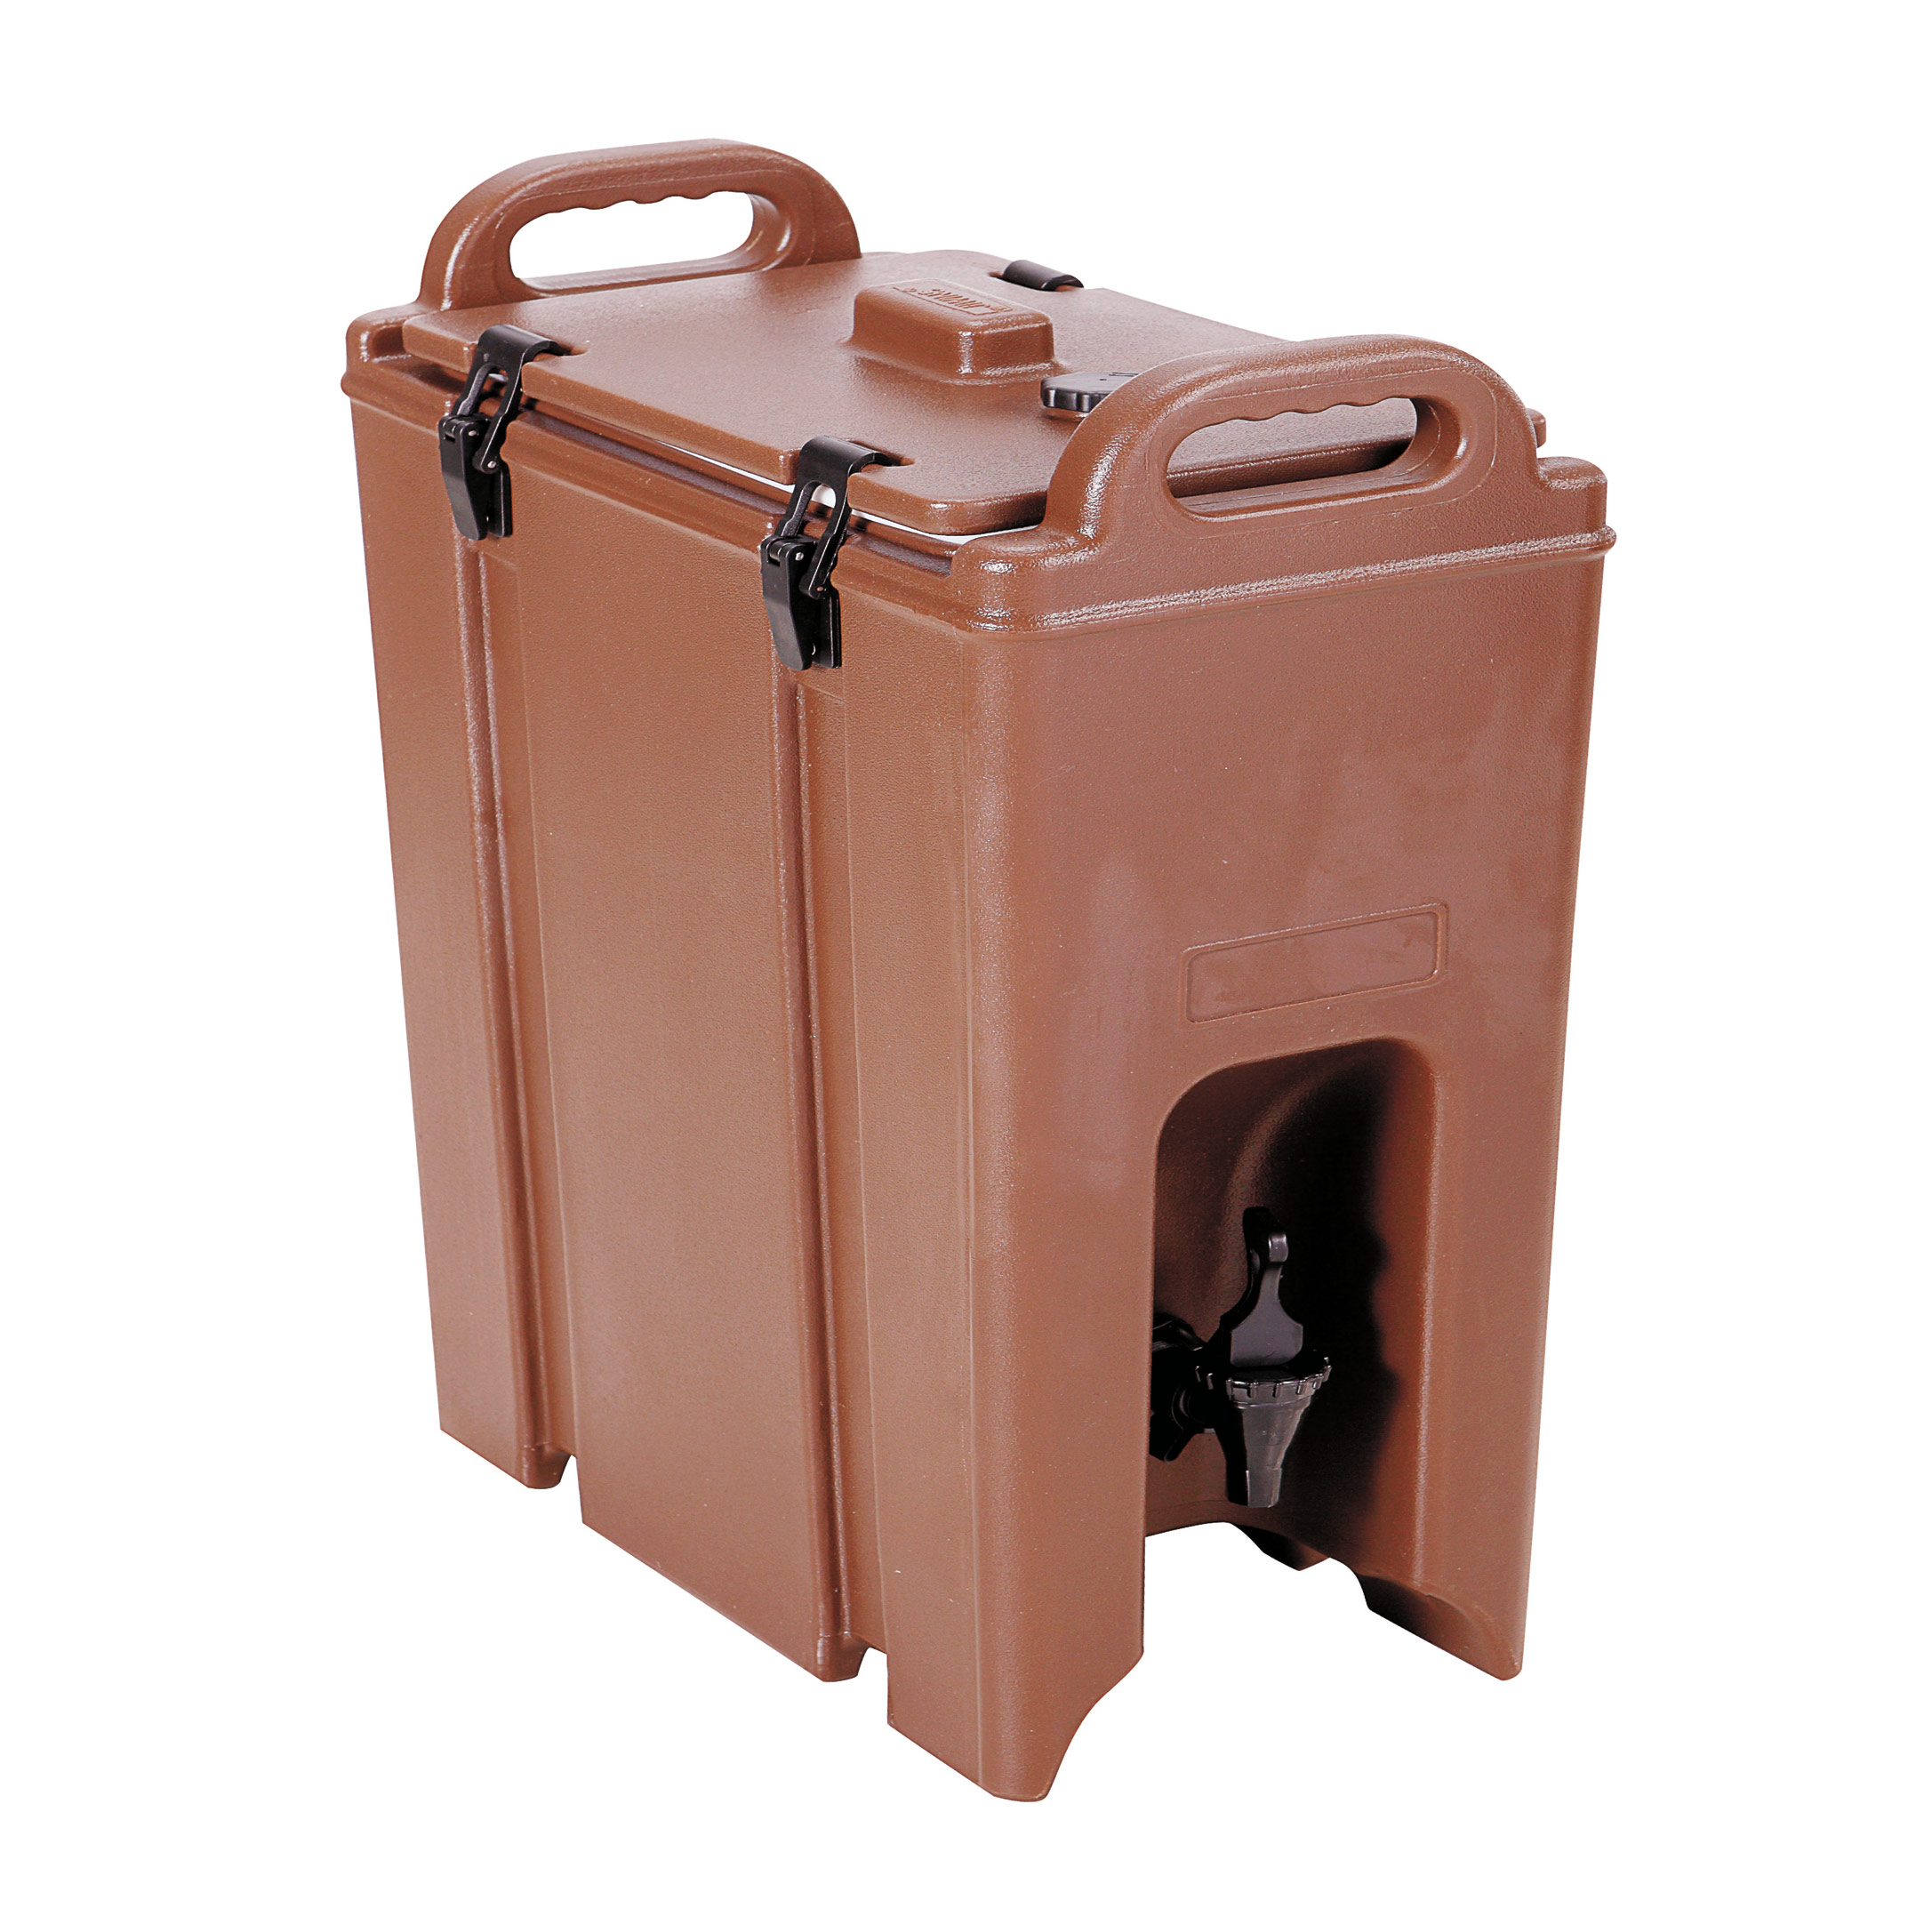 Royal Industries ROY BEV 18 beverage dispenser, insulated